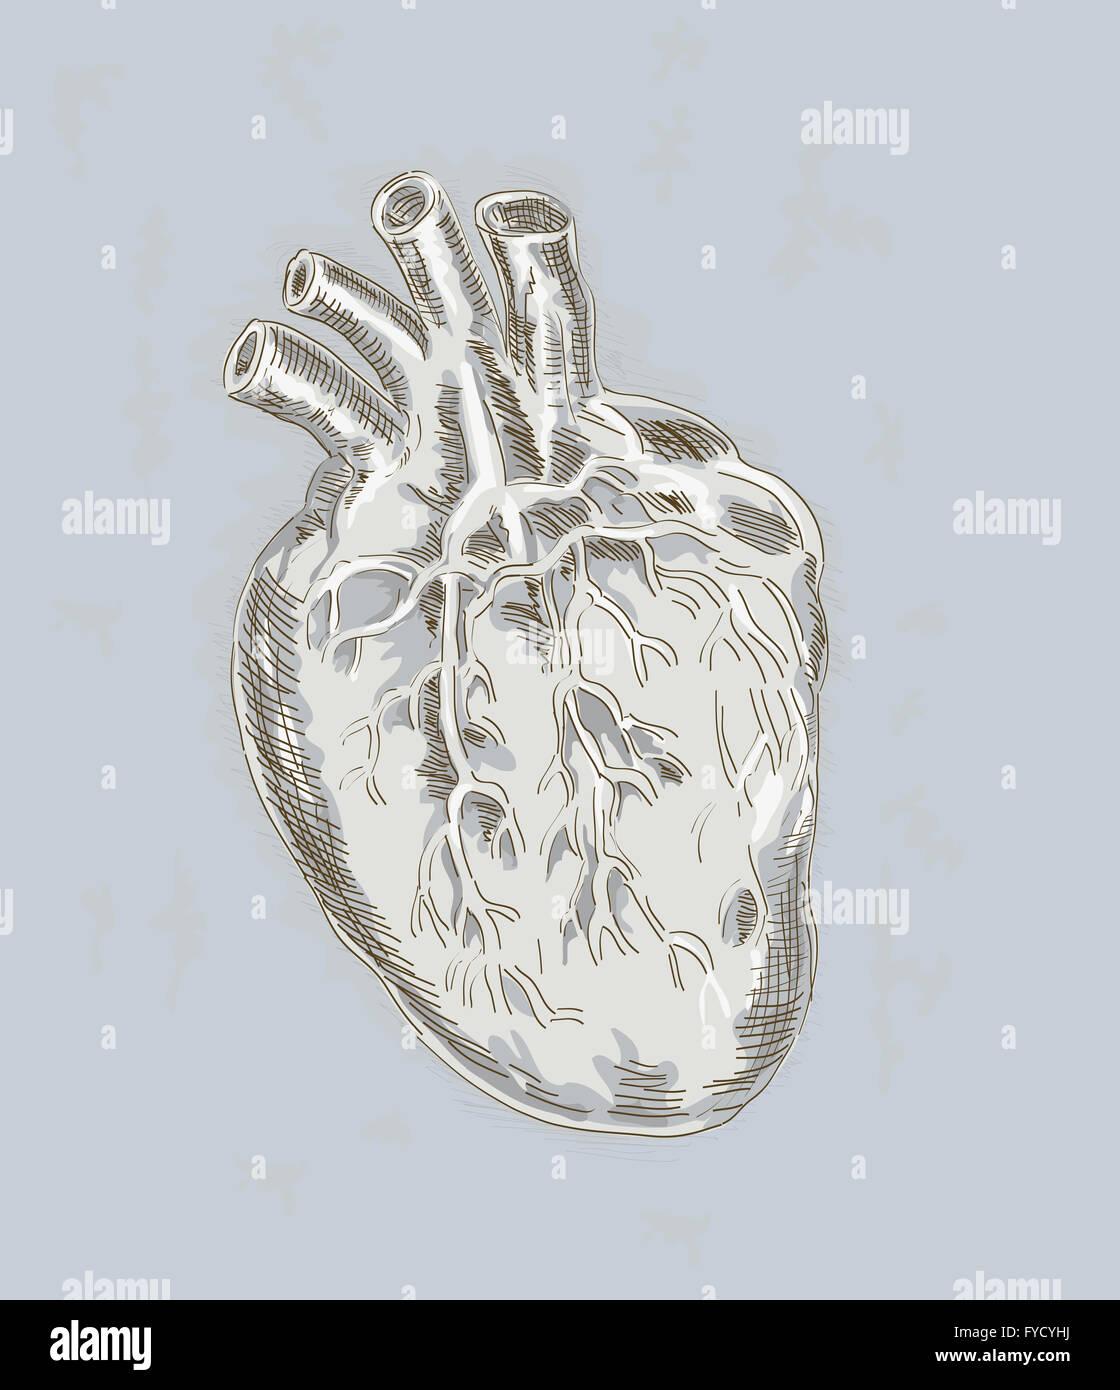 Heart Anatomy Stockfotos & Heart Anatomy Bilder - Alamy